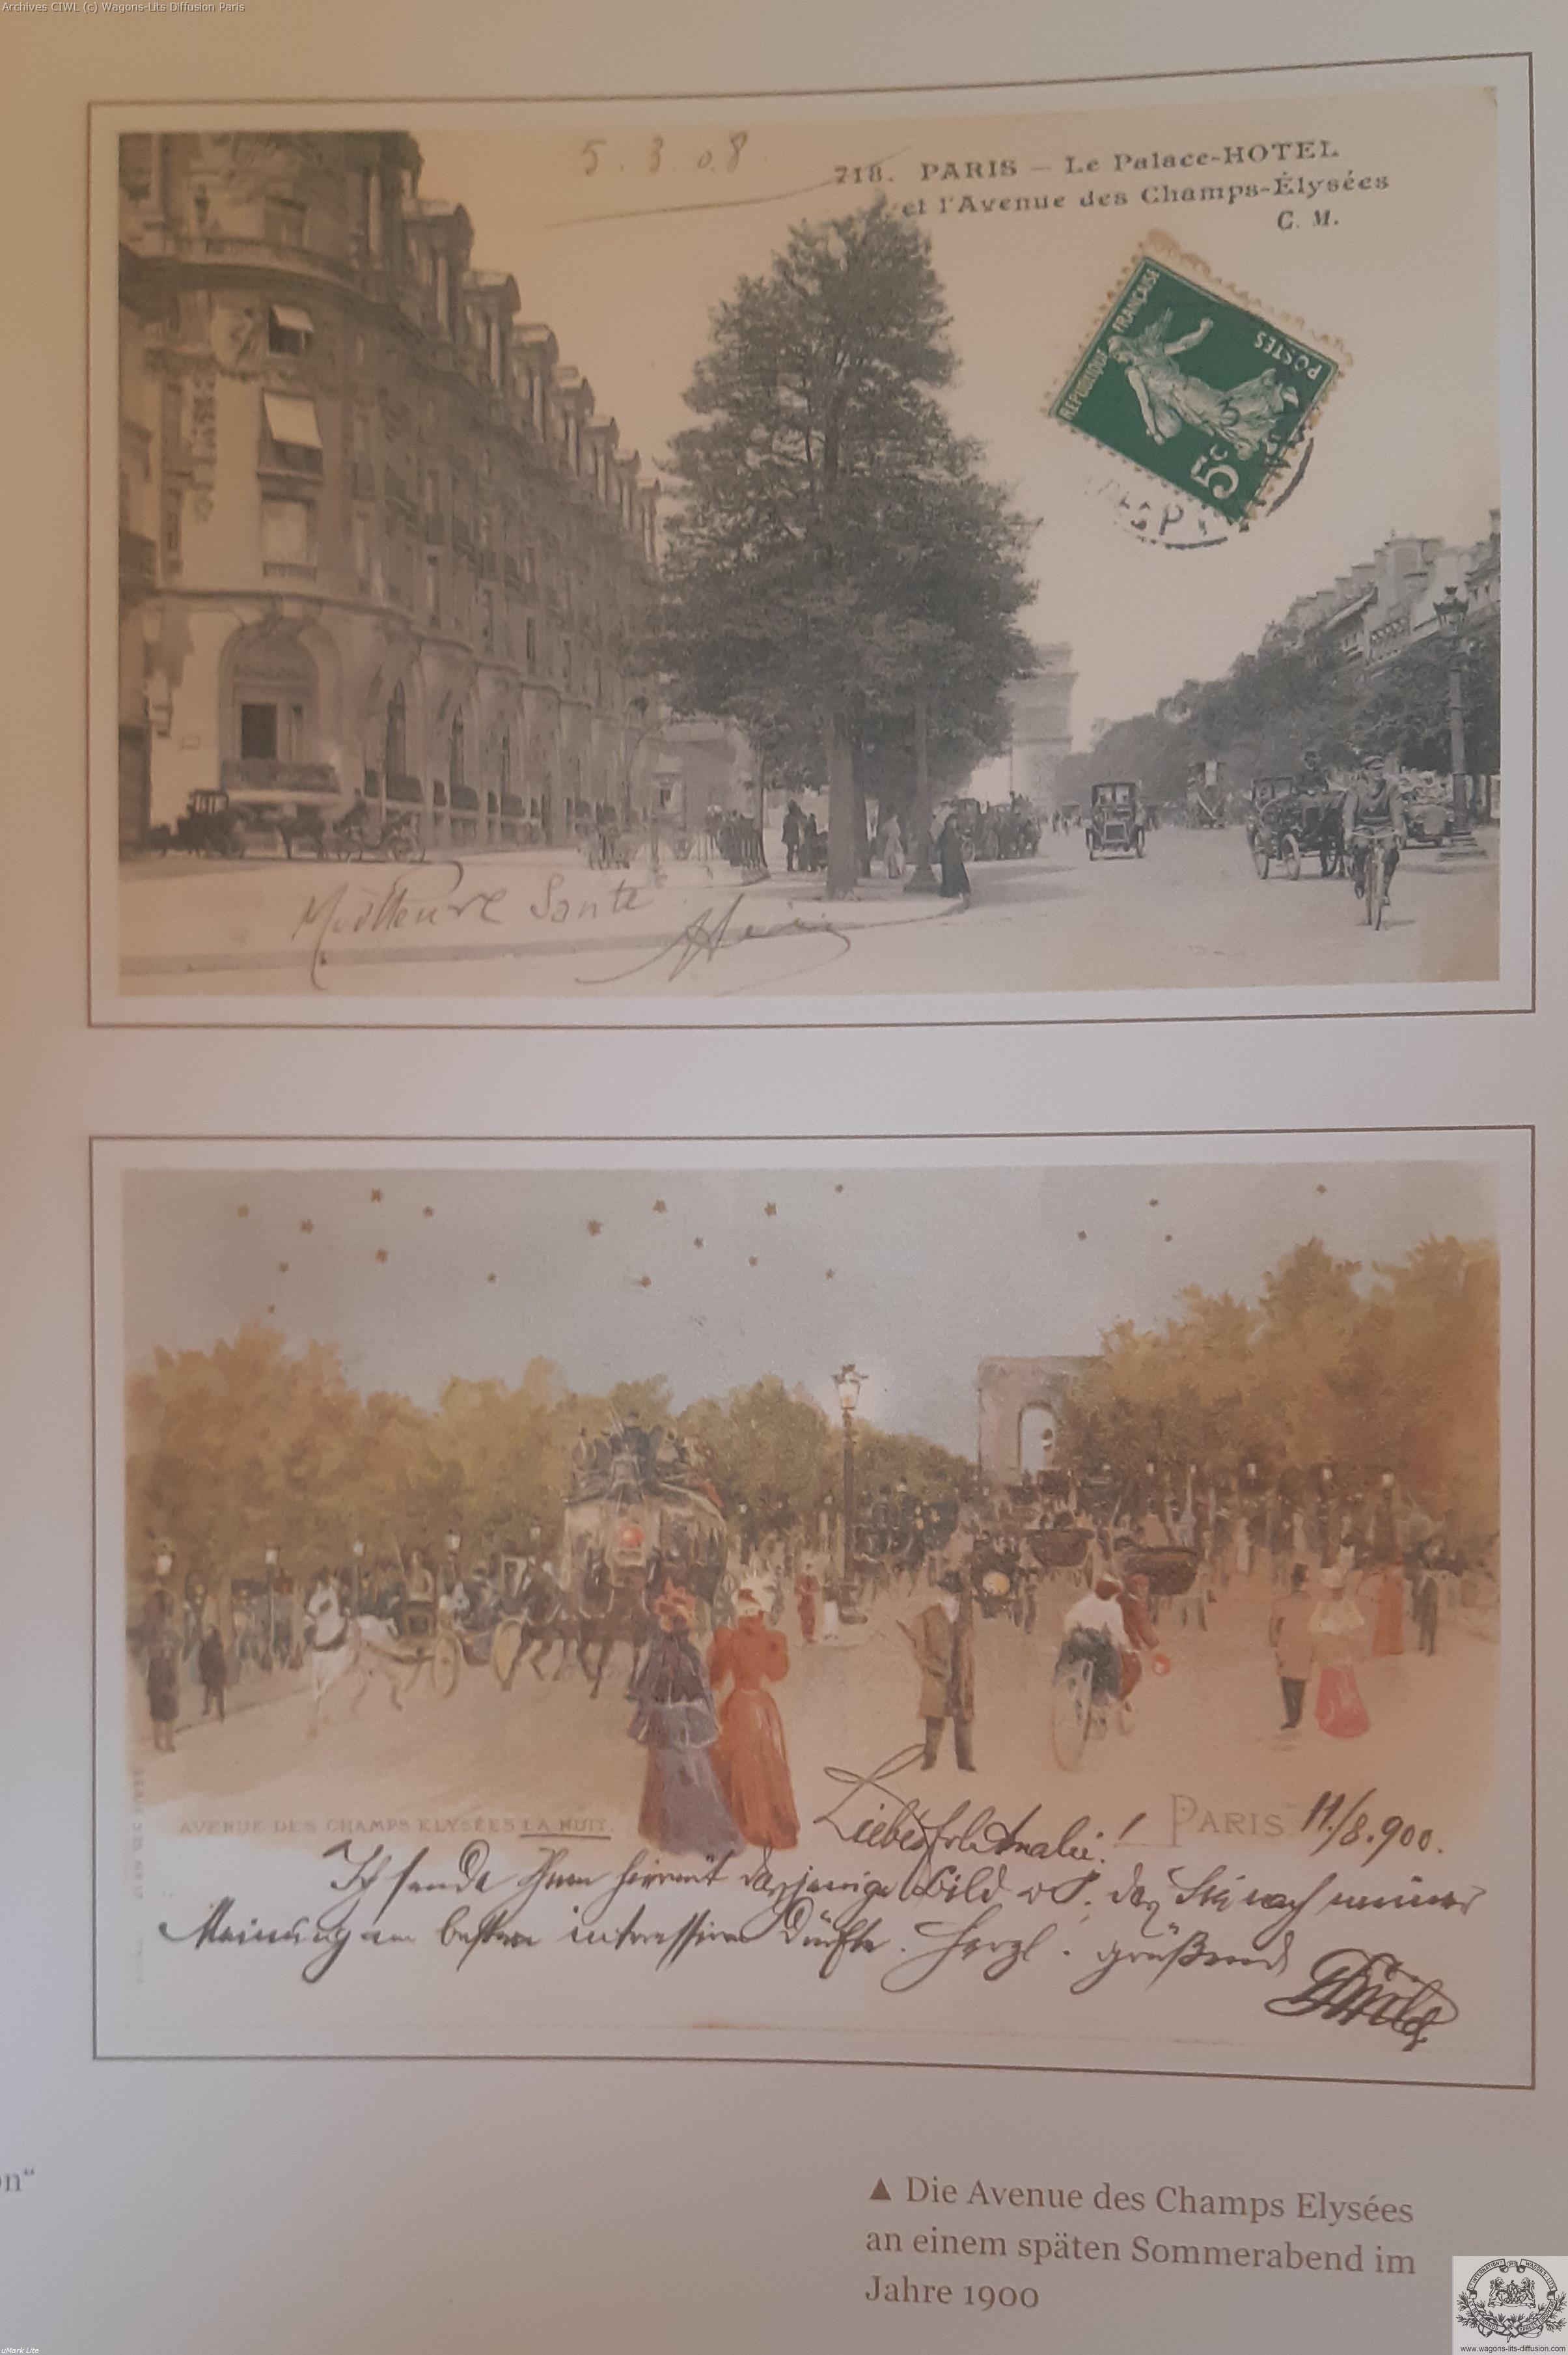 Wl elysees palace hotel paris 1900 cp